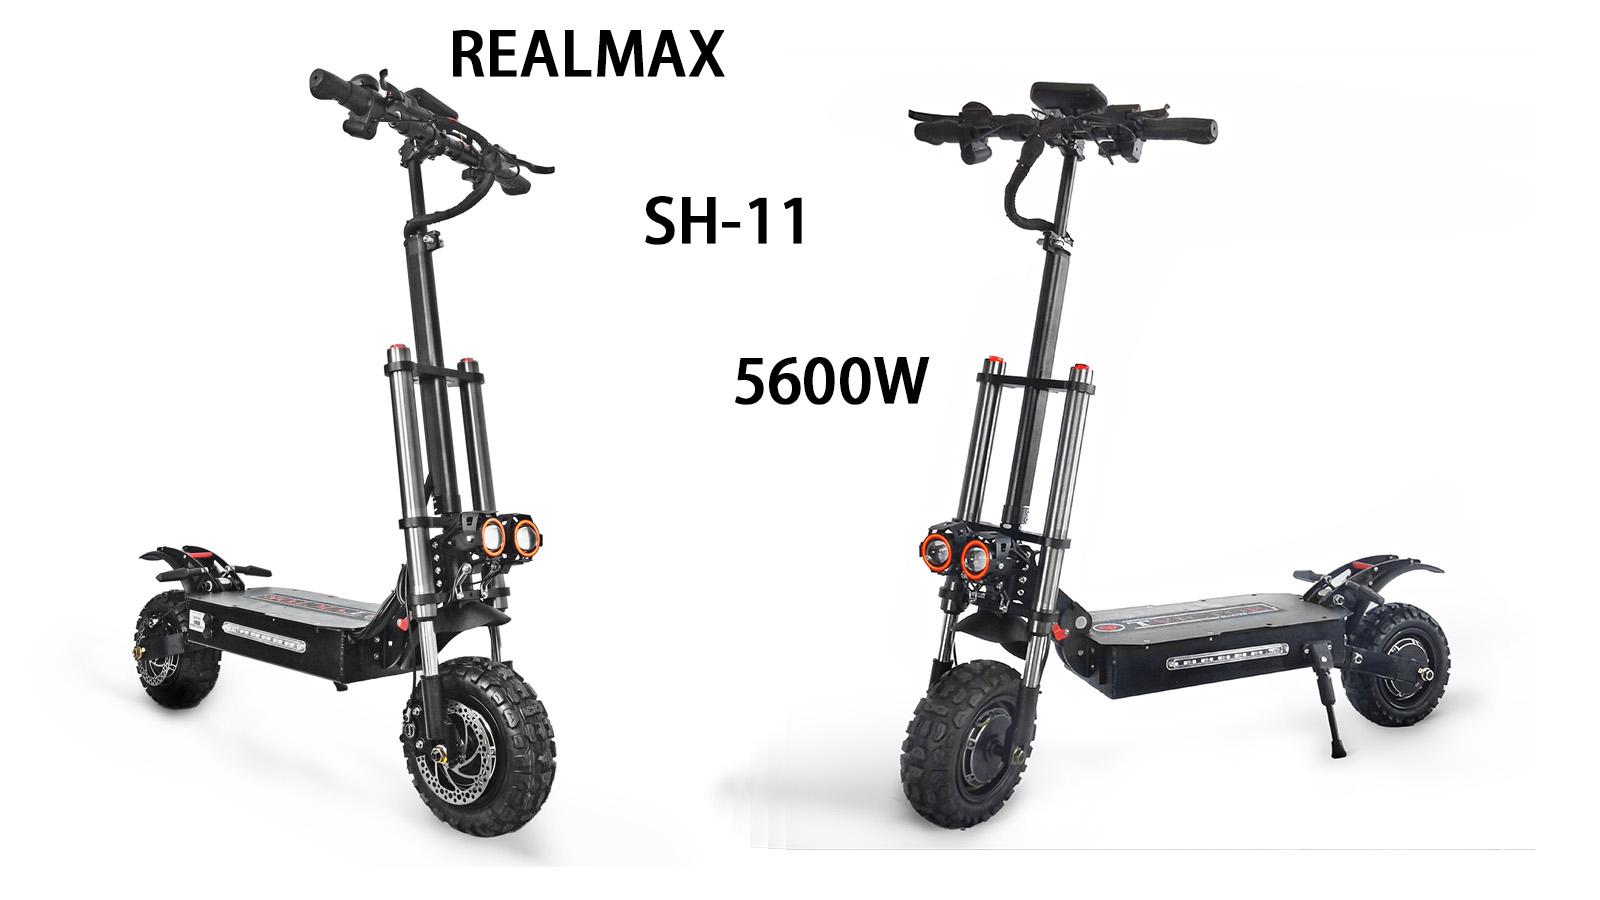 5600w 60v電動スクーター11インチ2モーターホイールリチウムバッテリー大人脂肪タイヤ折りたたみスケートボード